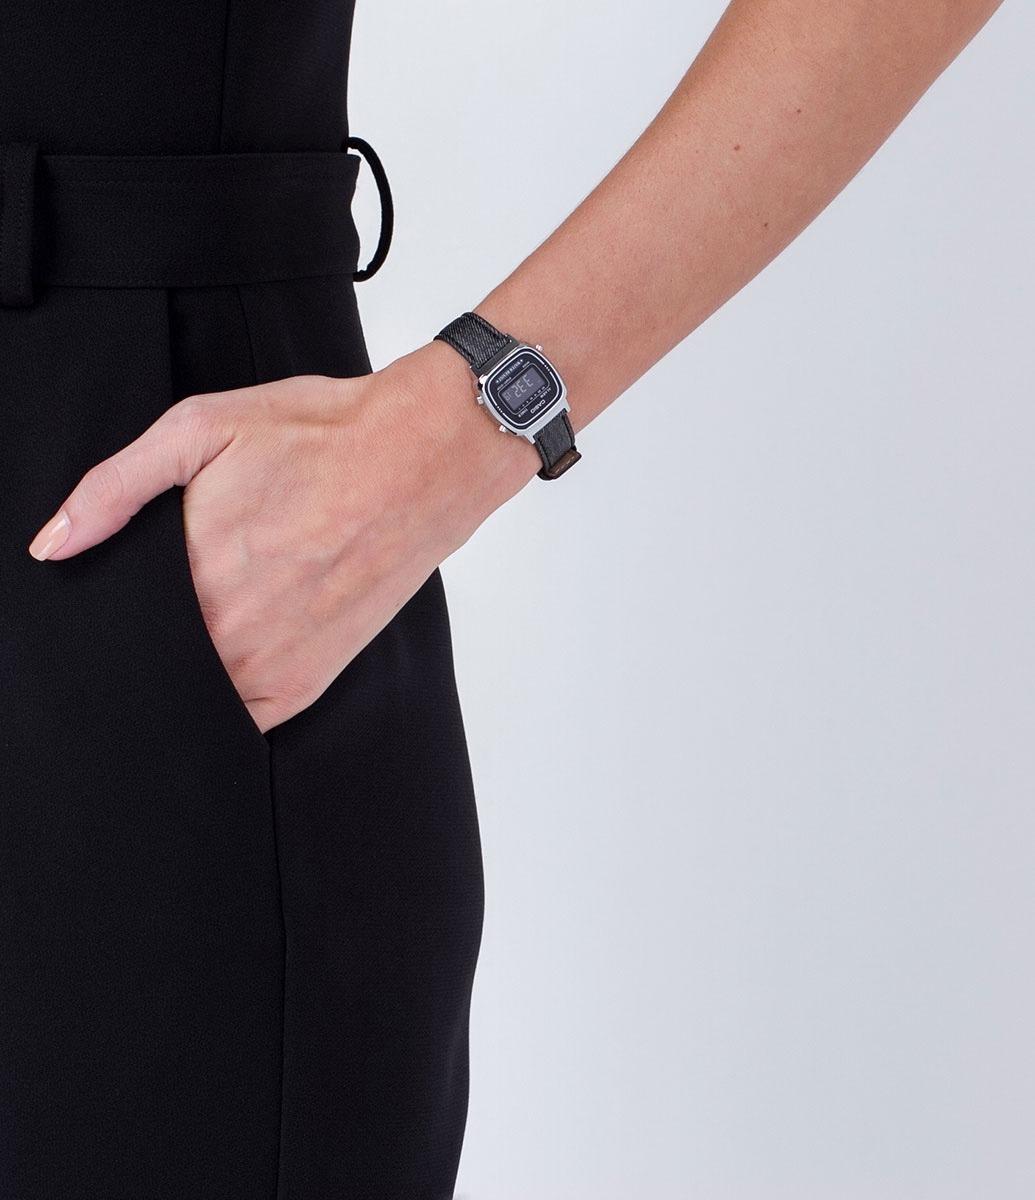 e4912f13825 Relógio Feminino Casio La670wl 1bd Pulseira Em Jeans - Loja - R  199 ...